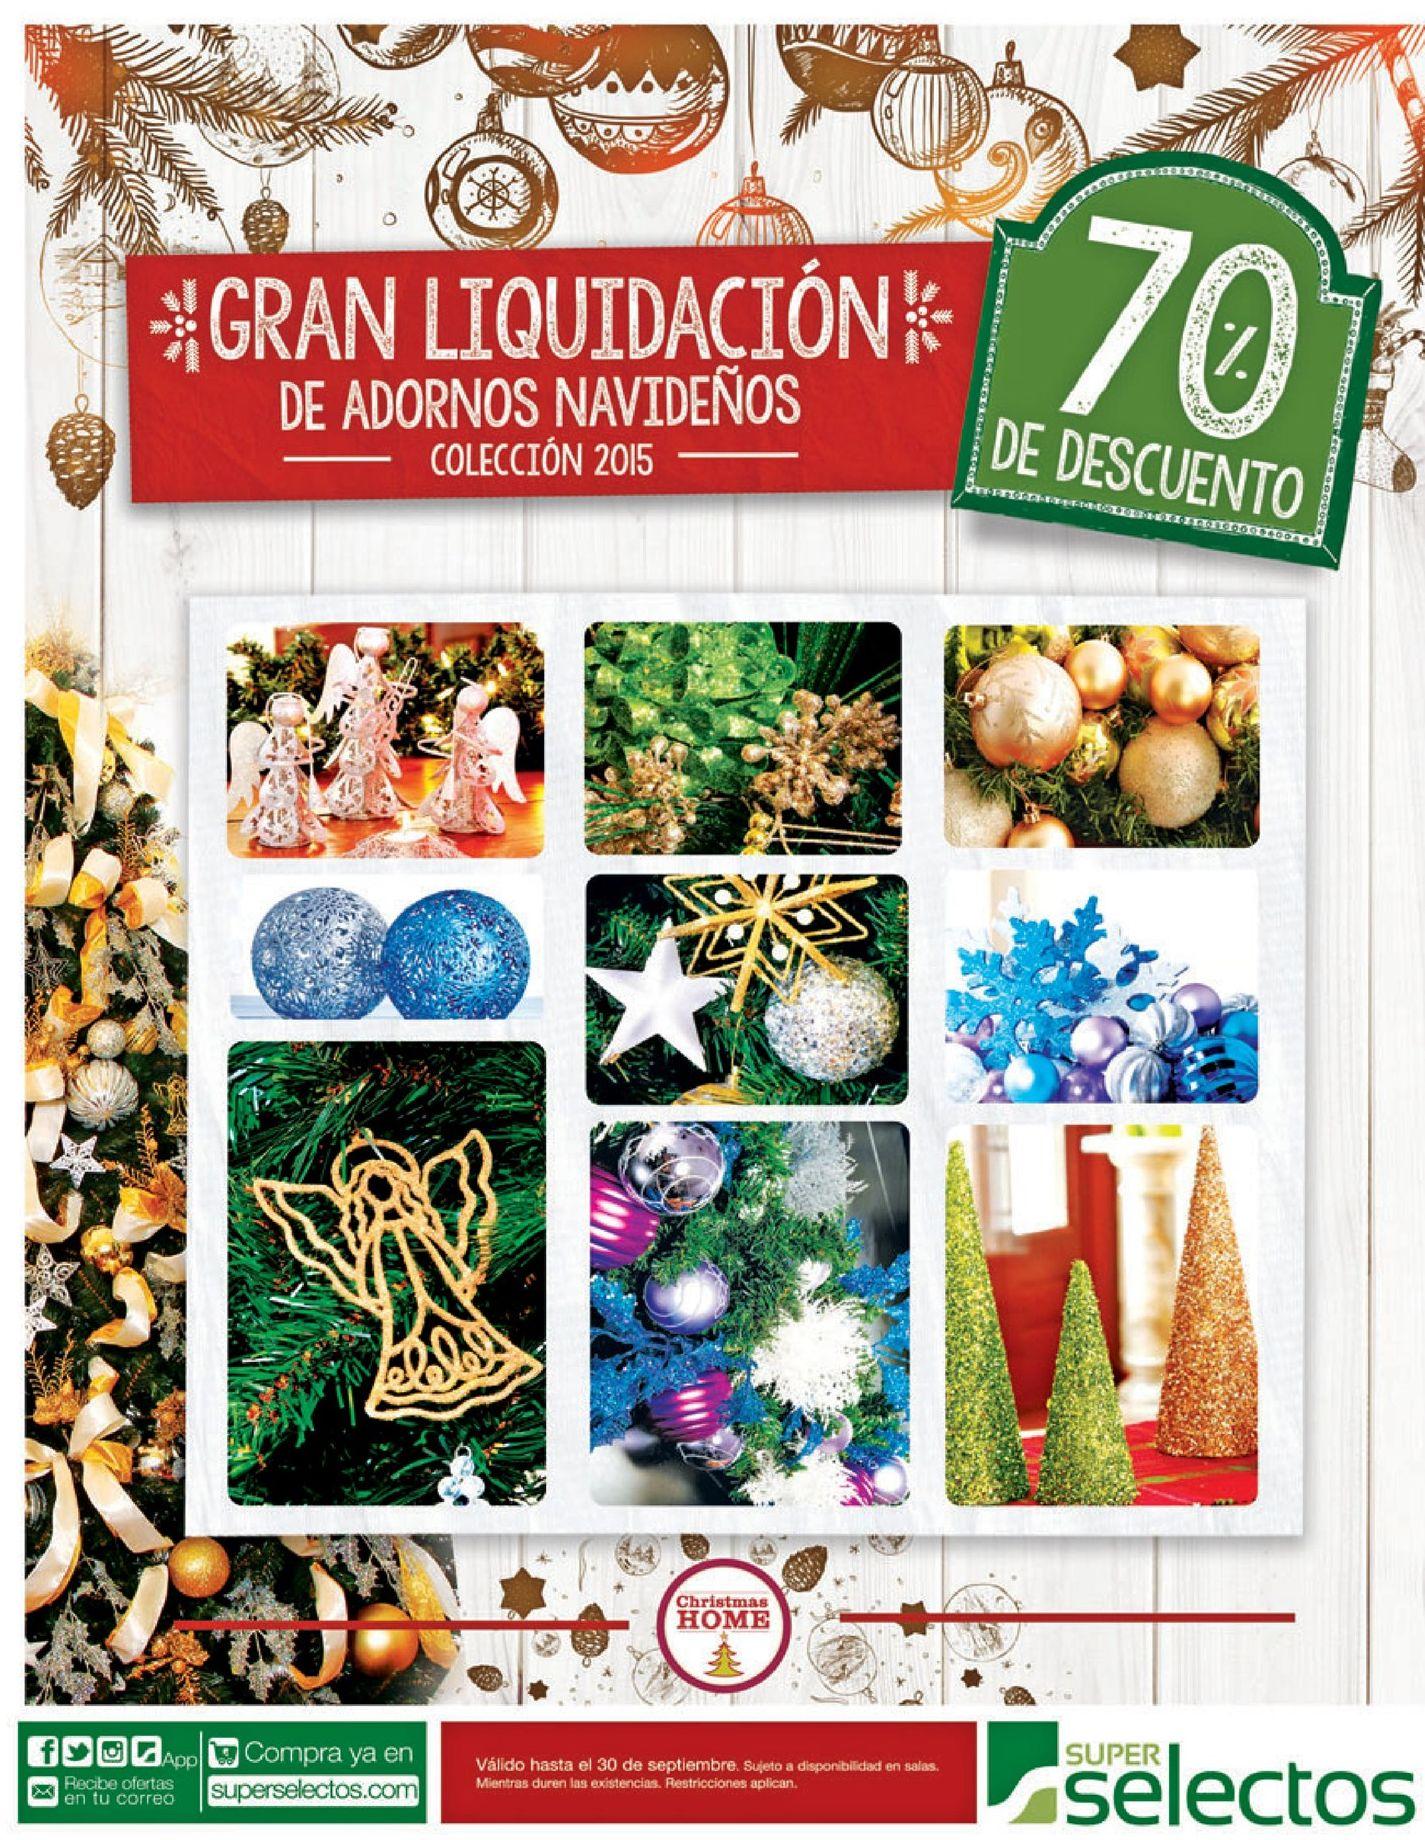 gran-liquidacion-70-off-en-adornos-navidenos-gracias-a-super-selectos